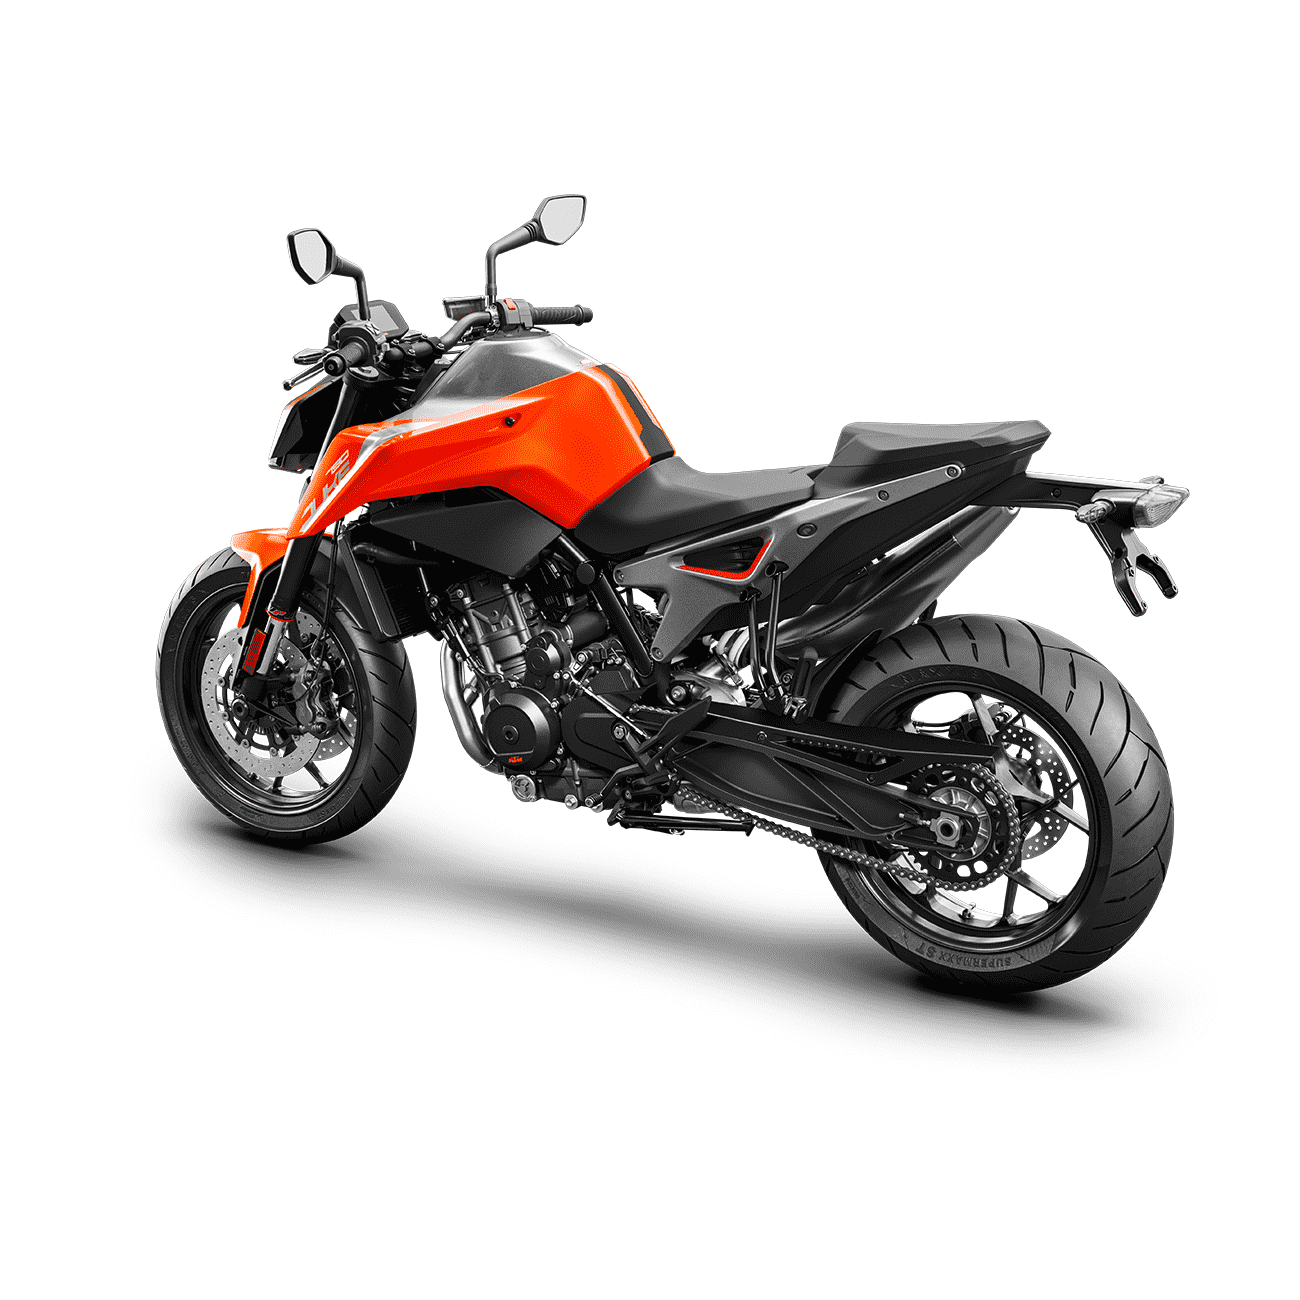 MOTOCICLETA 790 DUKE 2020